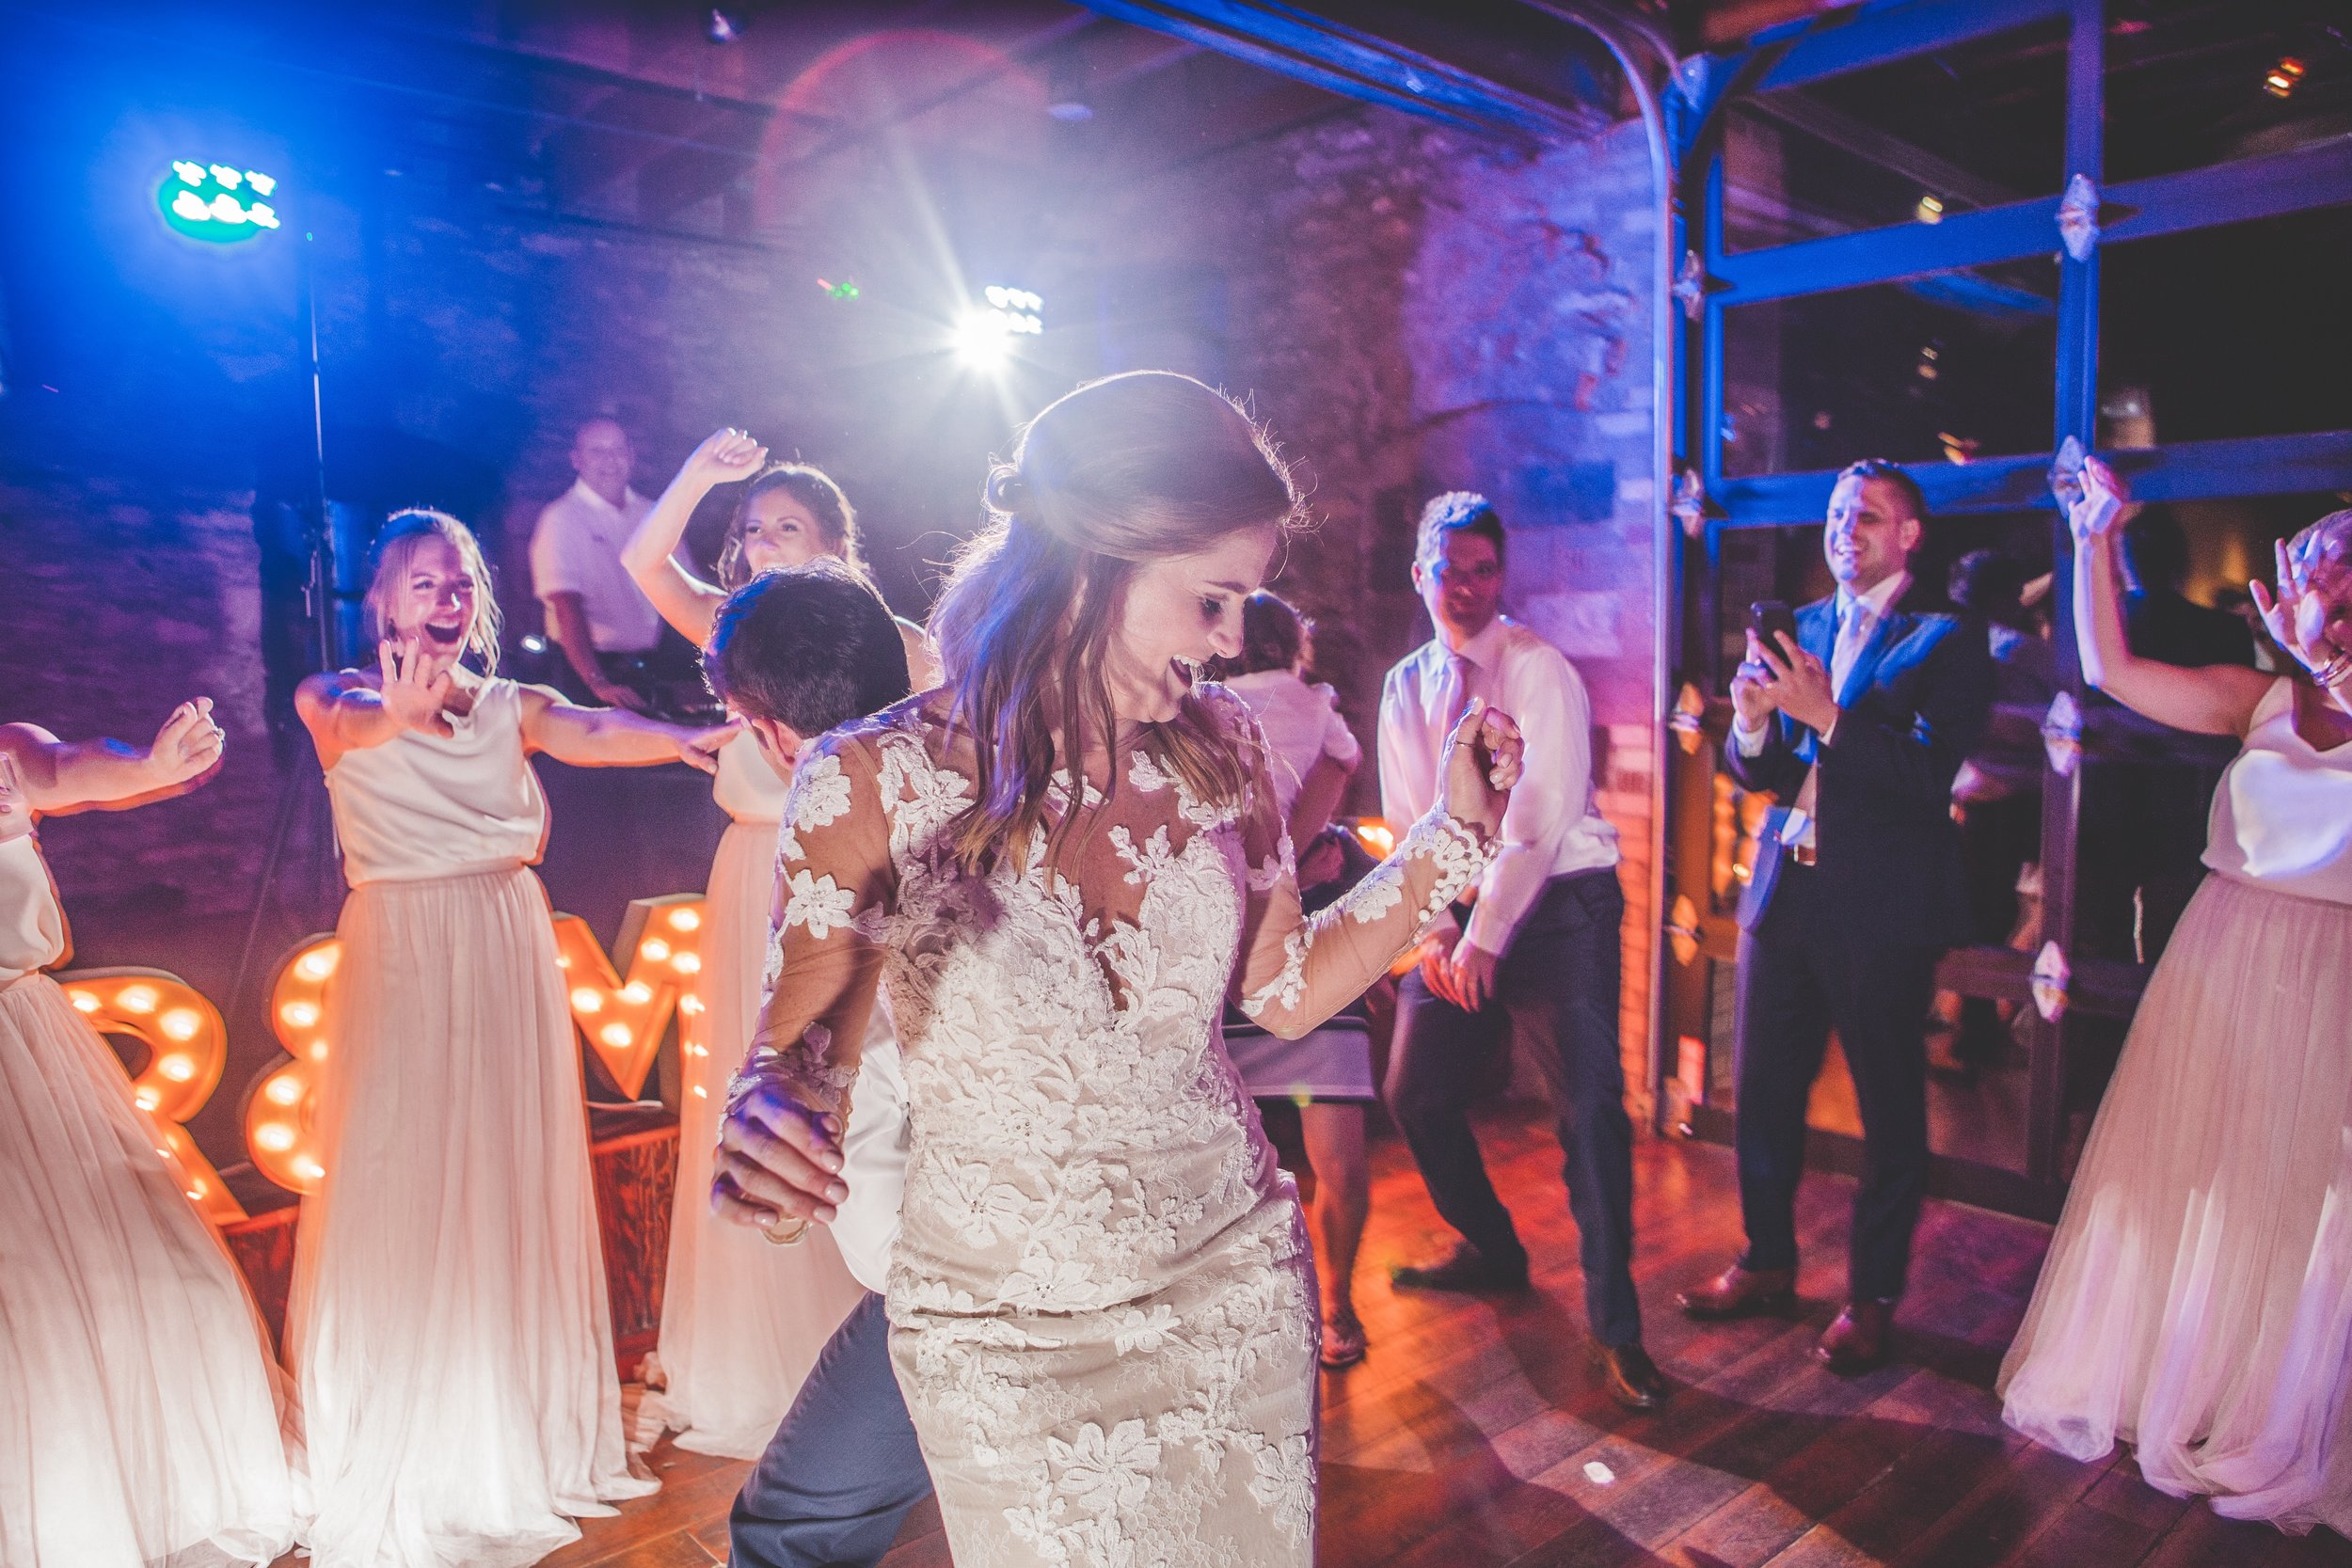 cider-gallery-lawrence-ks-wedding-photographer-jason-domingues-photography-lindsey-paul-blog-0047.jpg